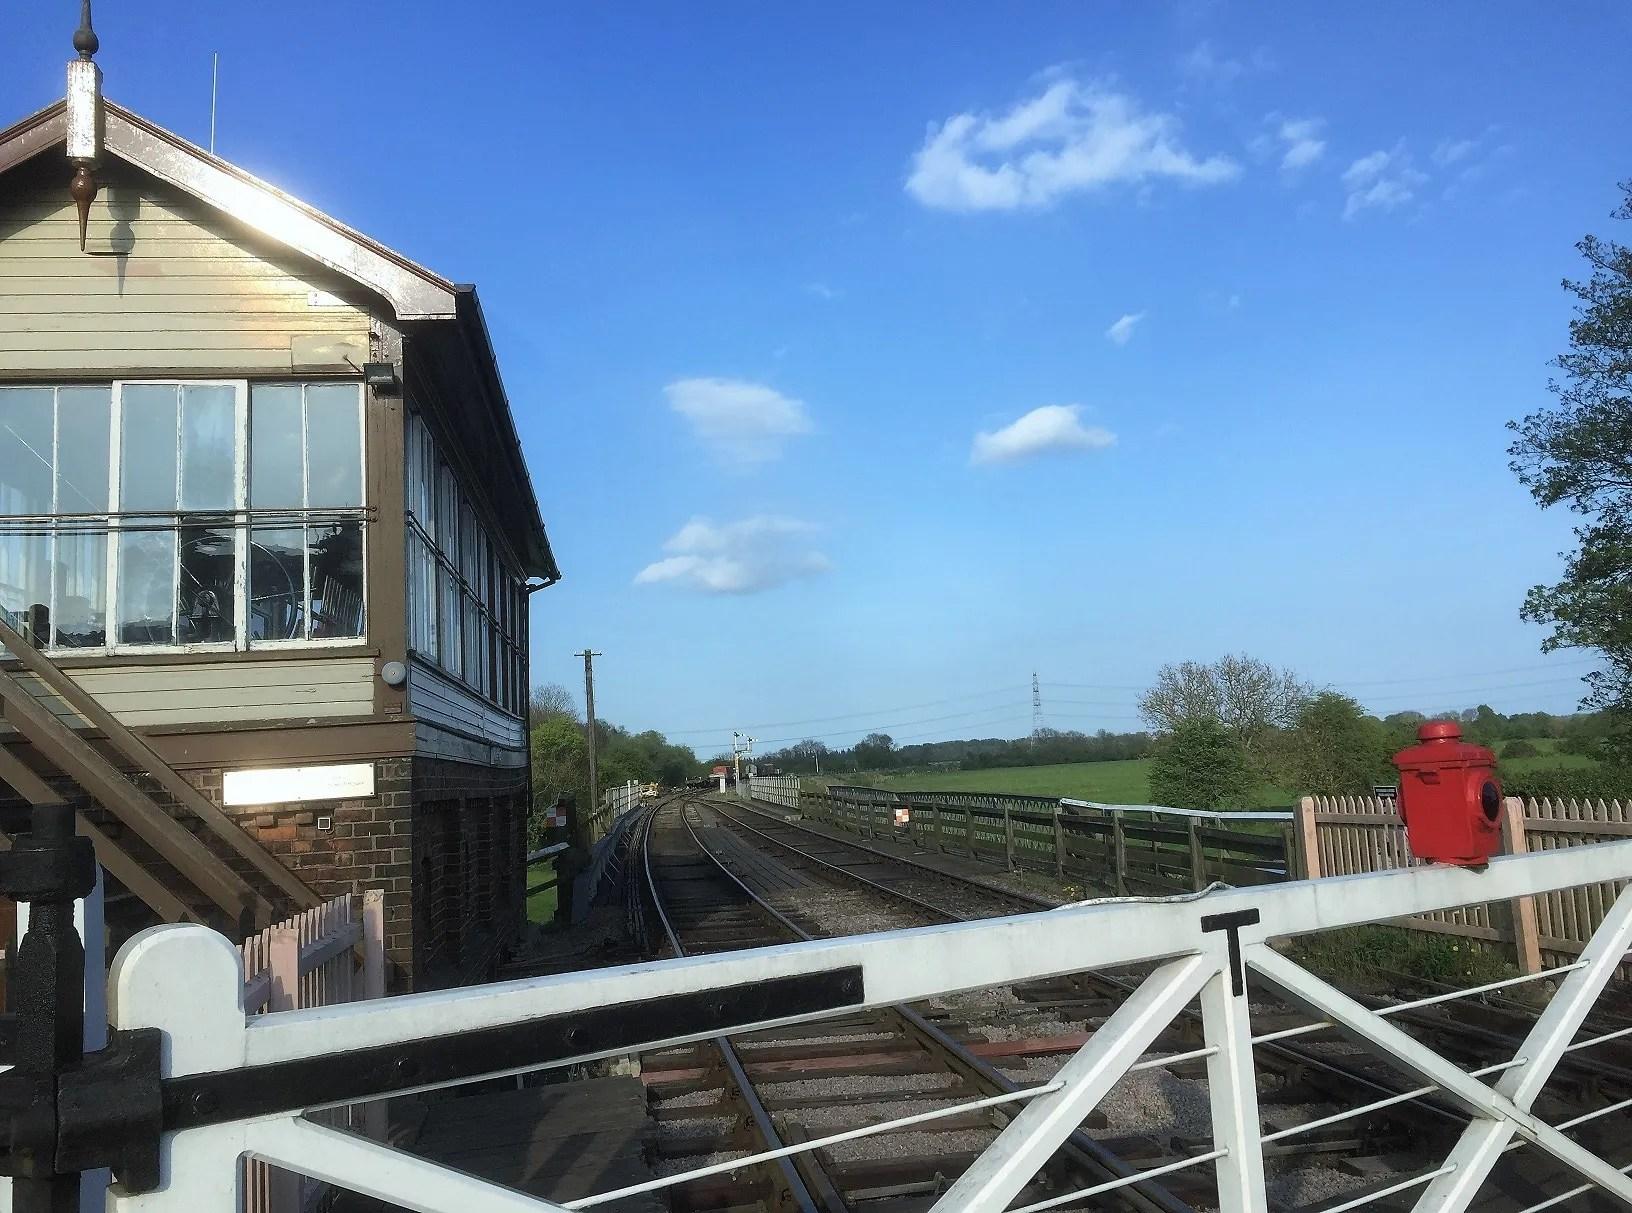 Wansford Signal Box on the Nene Valley Railway